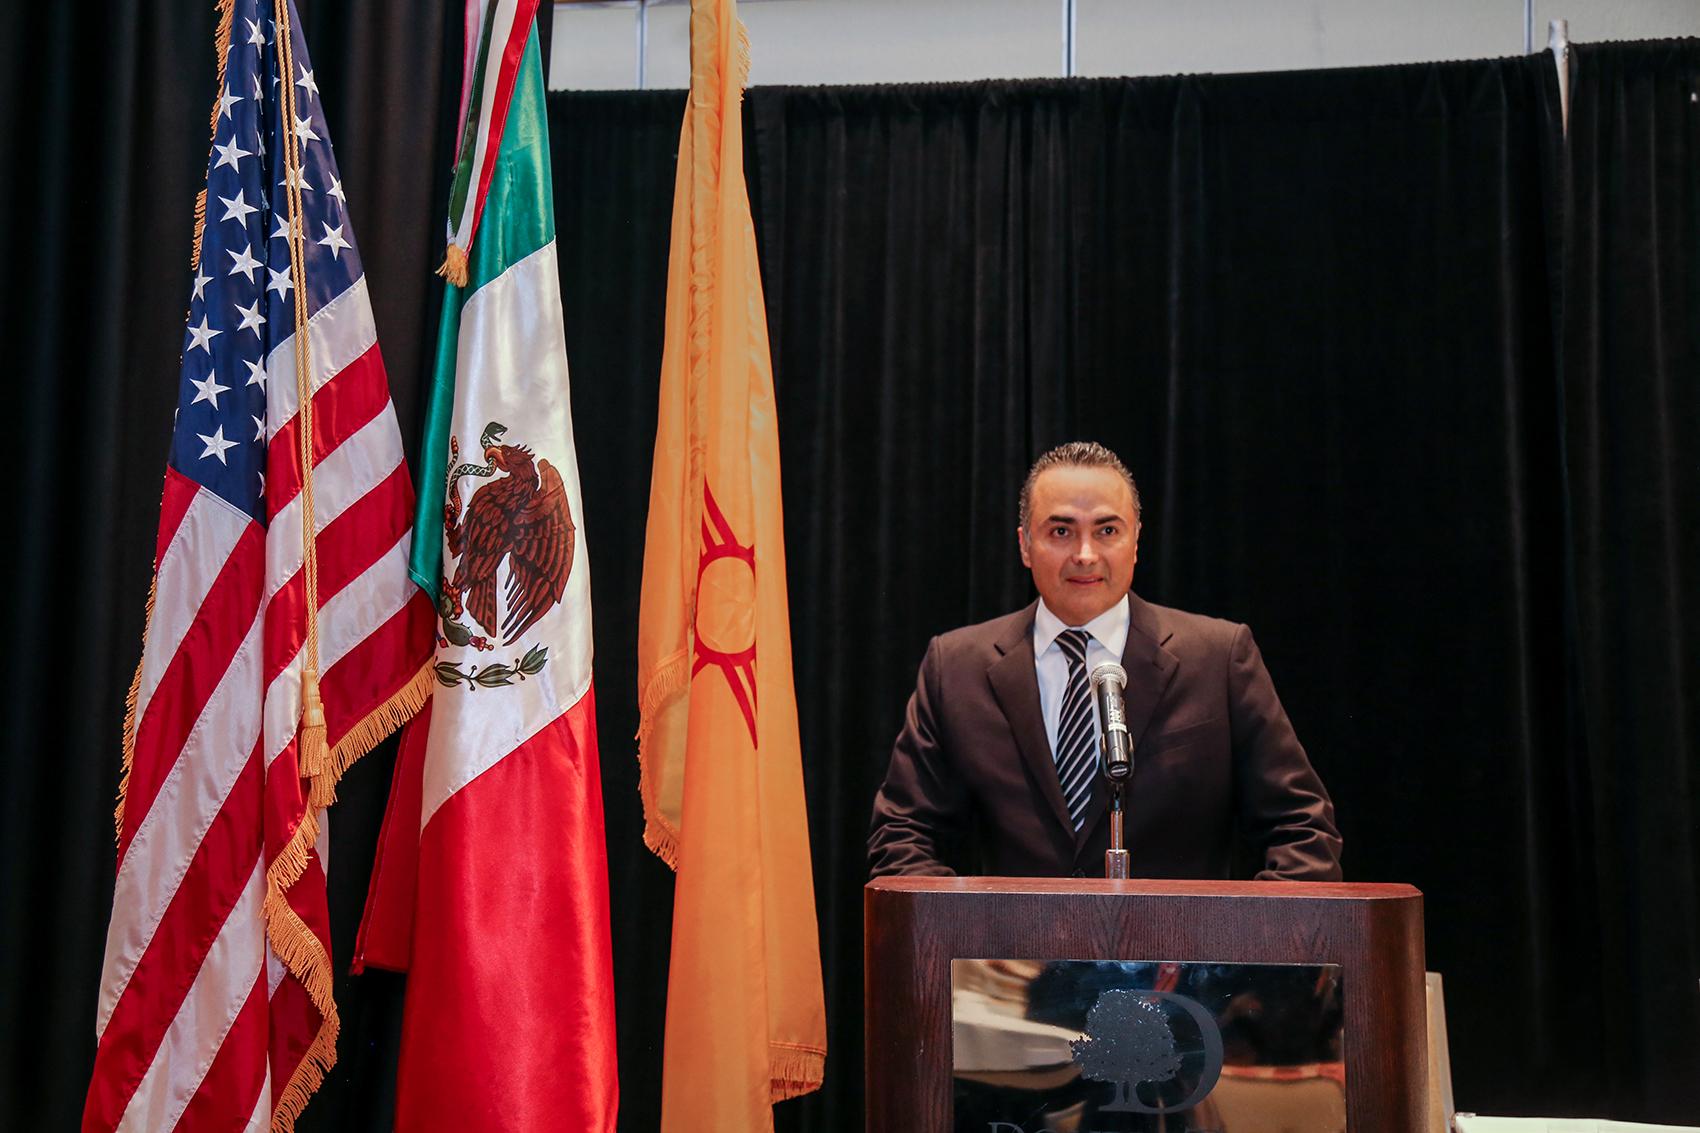 David Villanueva da conferencia en foro de alcaldes en EU